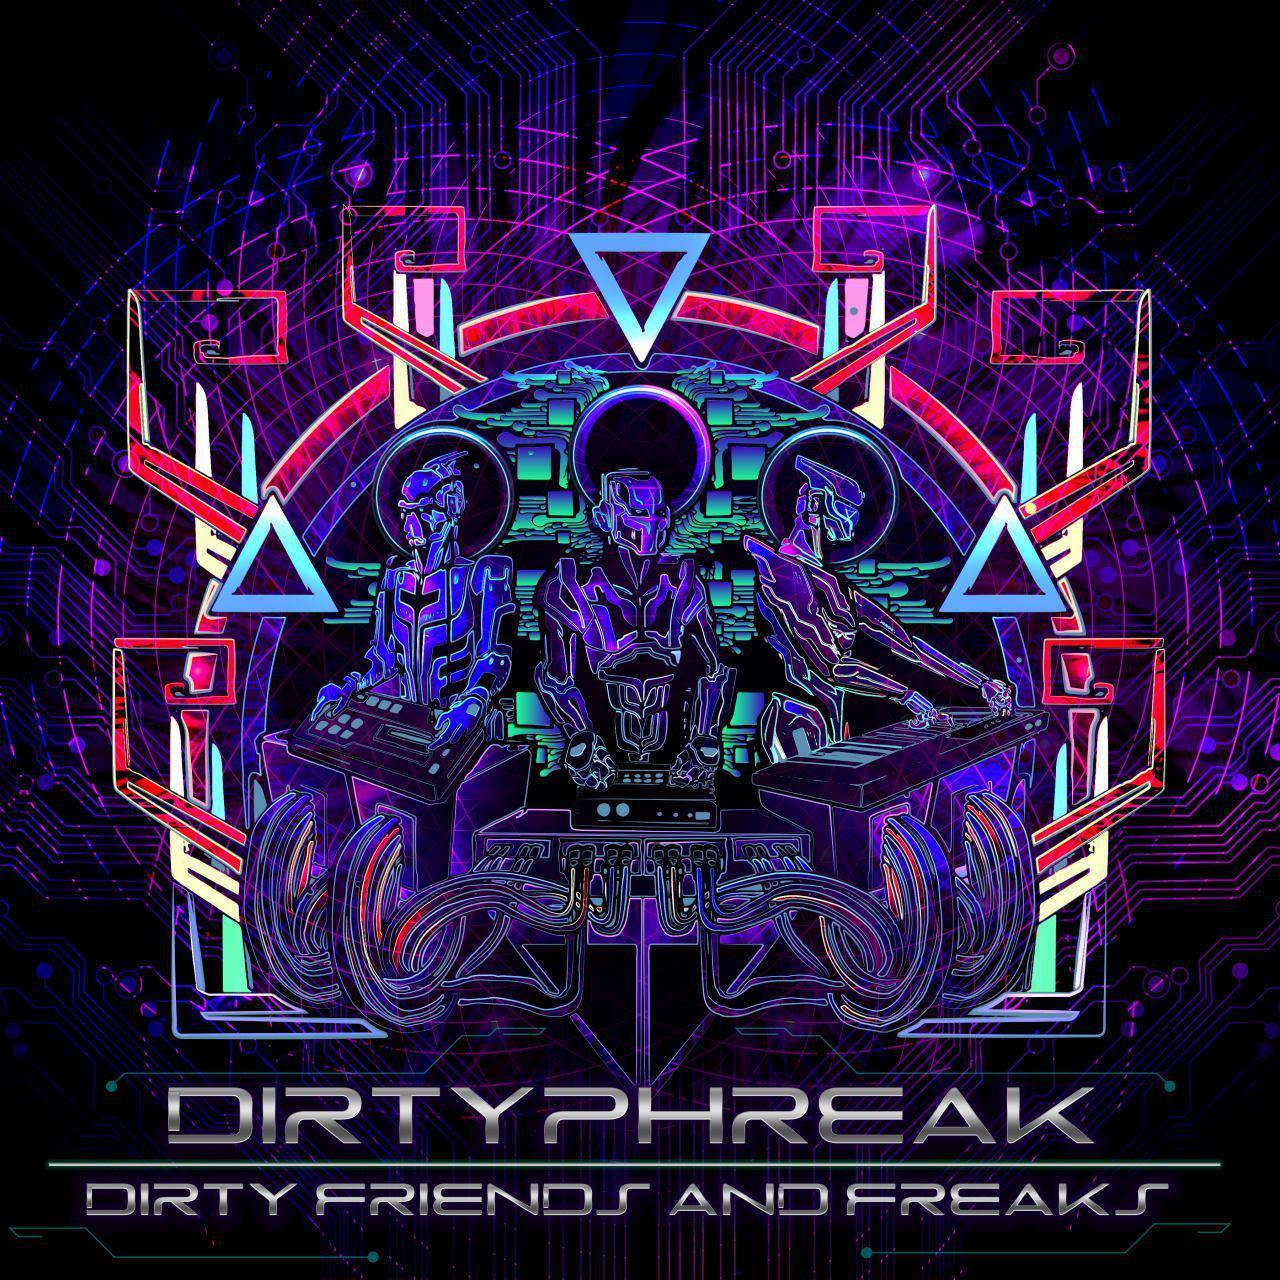 Hitech Trance Dirtyphreak - Dirty Friends And Freaks - Lamat Records